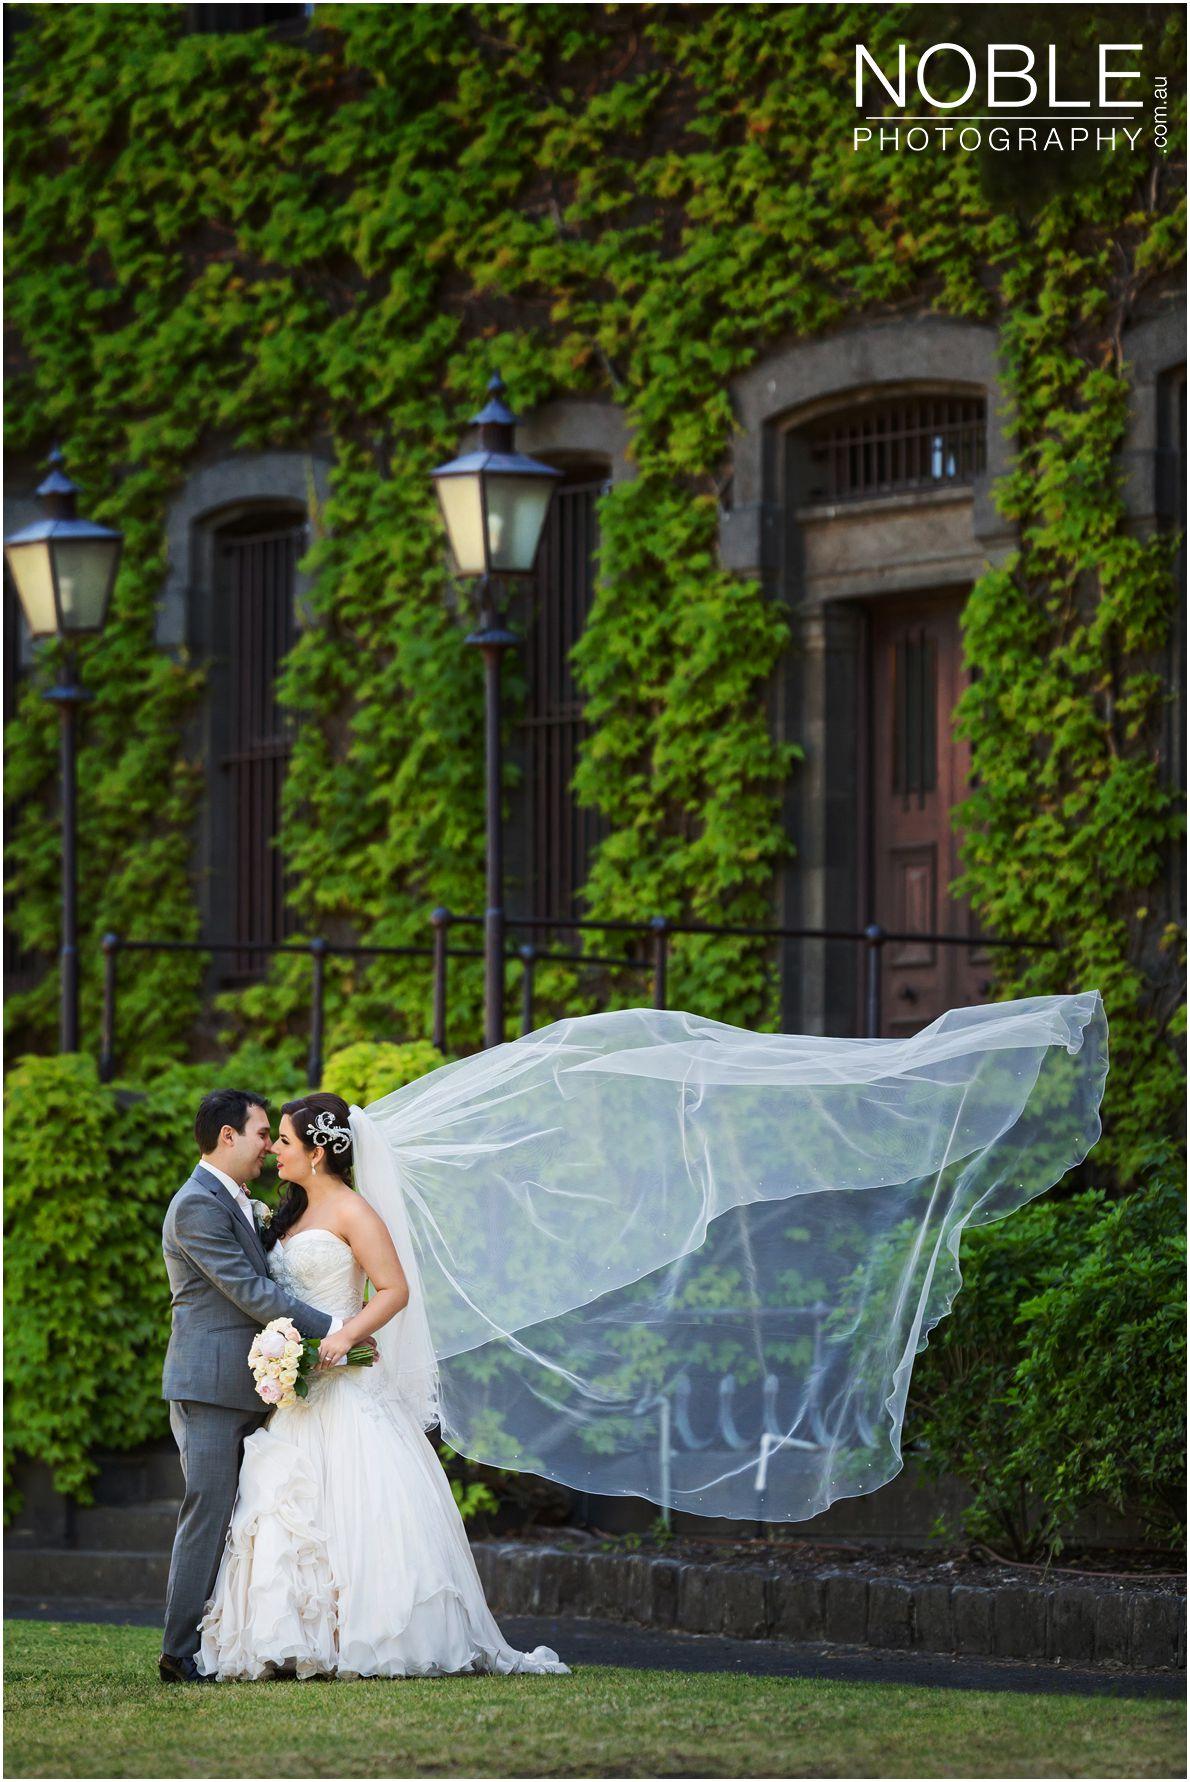 Bride's veil flying in the wind